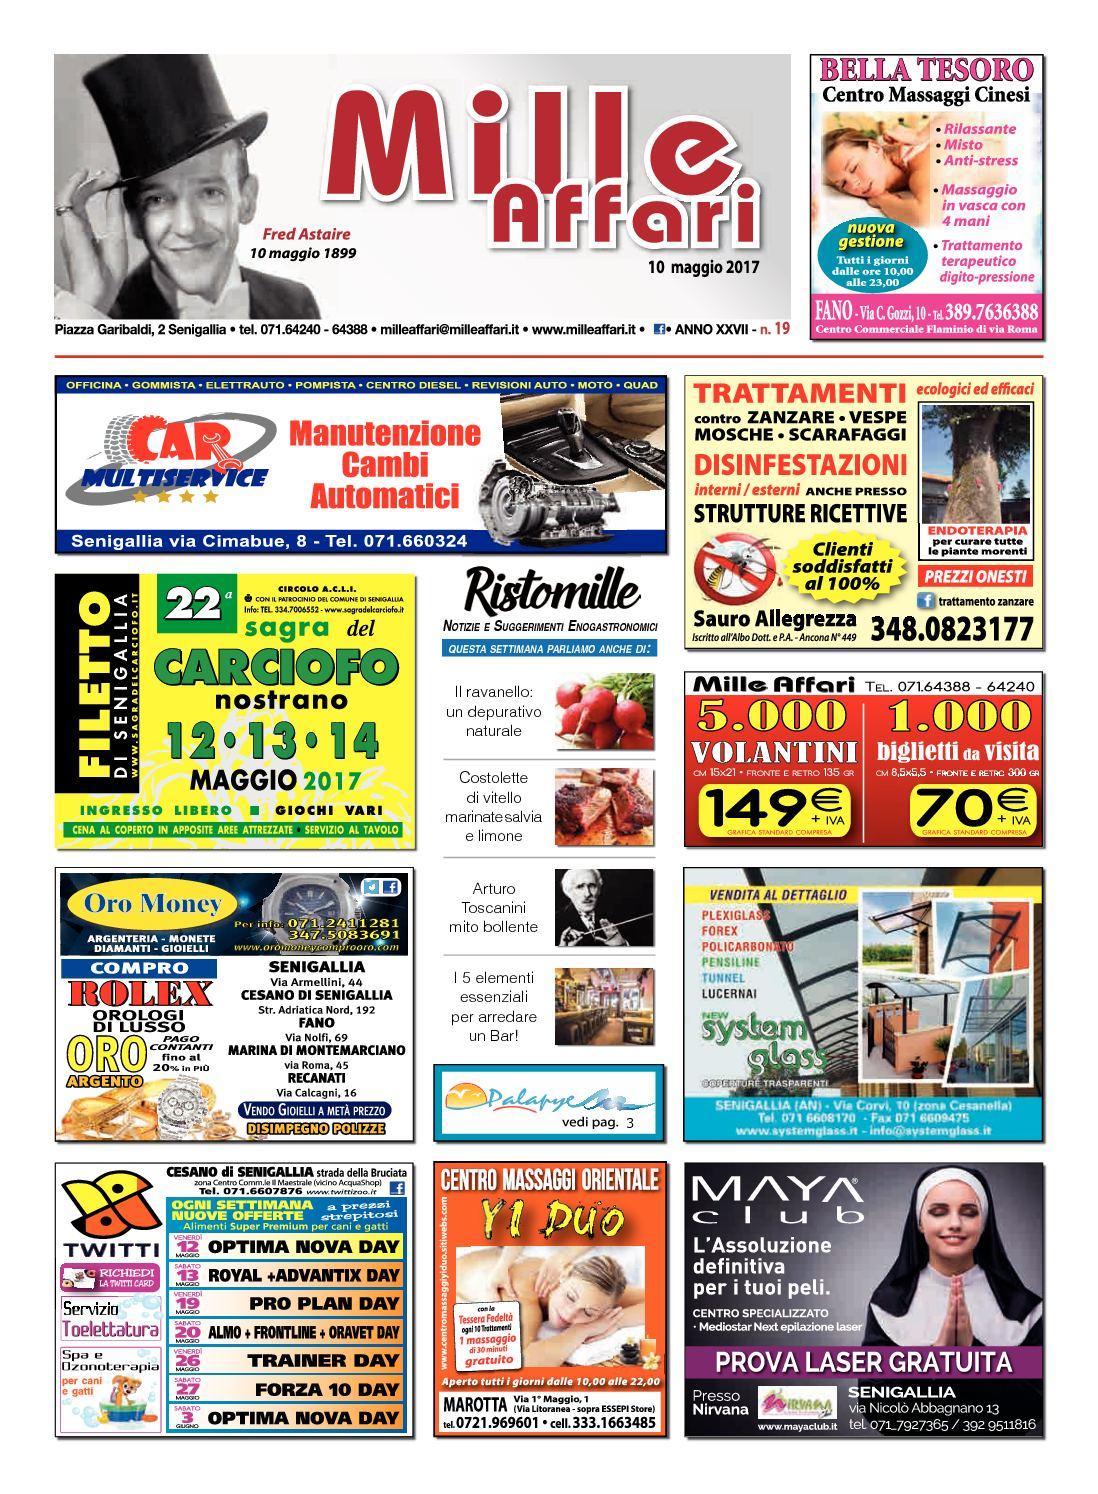 Calaméo - Milleaffari N°19 Del 10.05.17 a20a6014e43